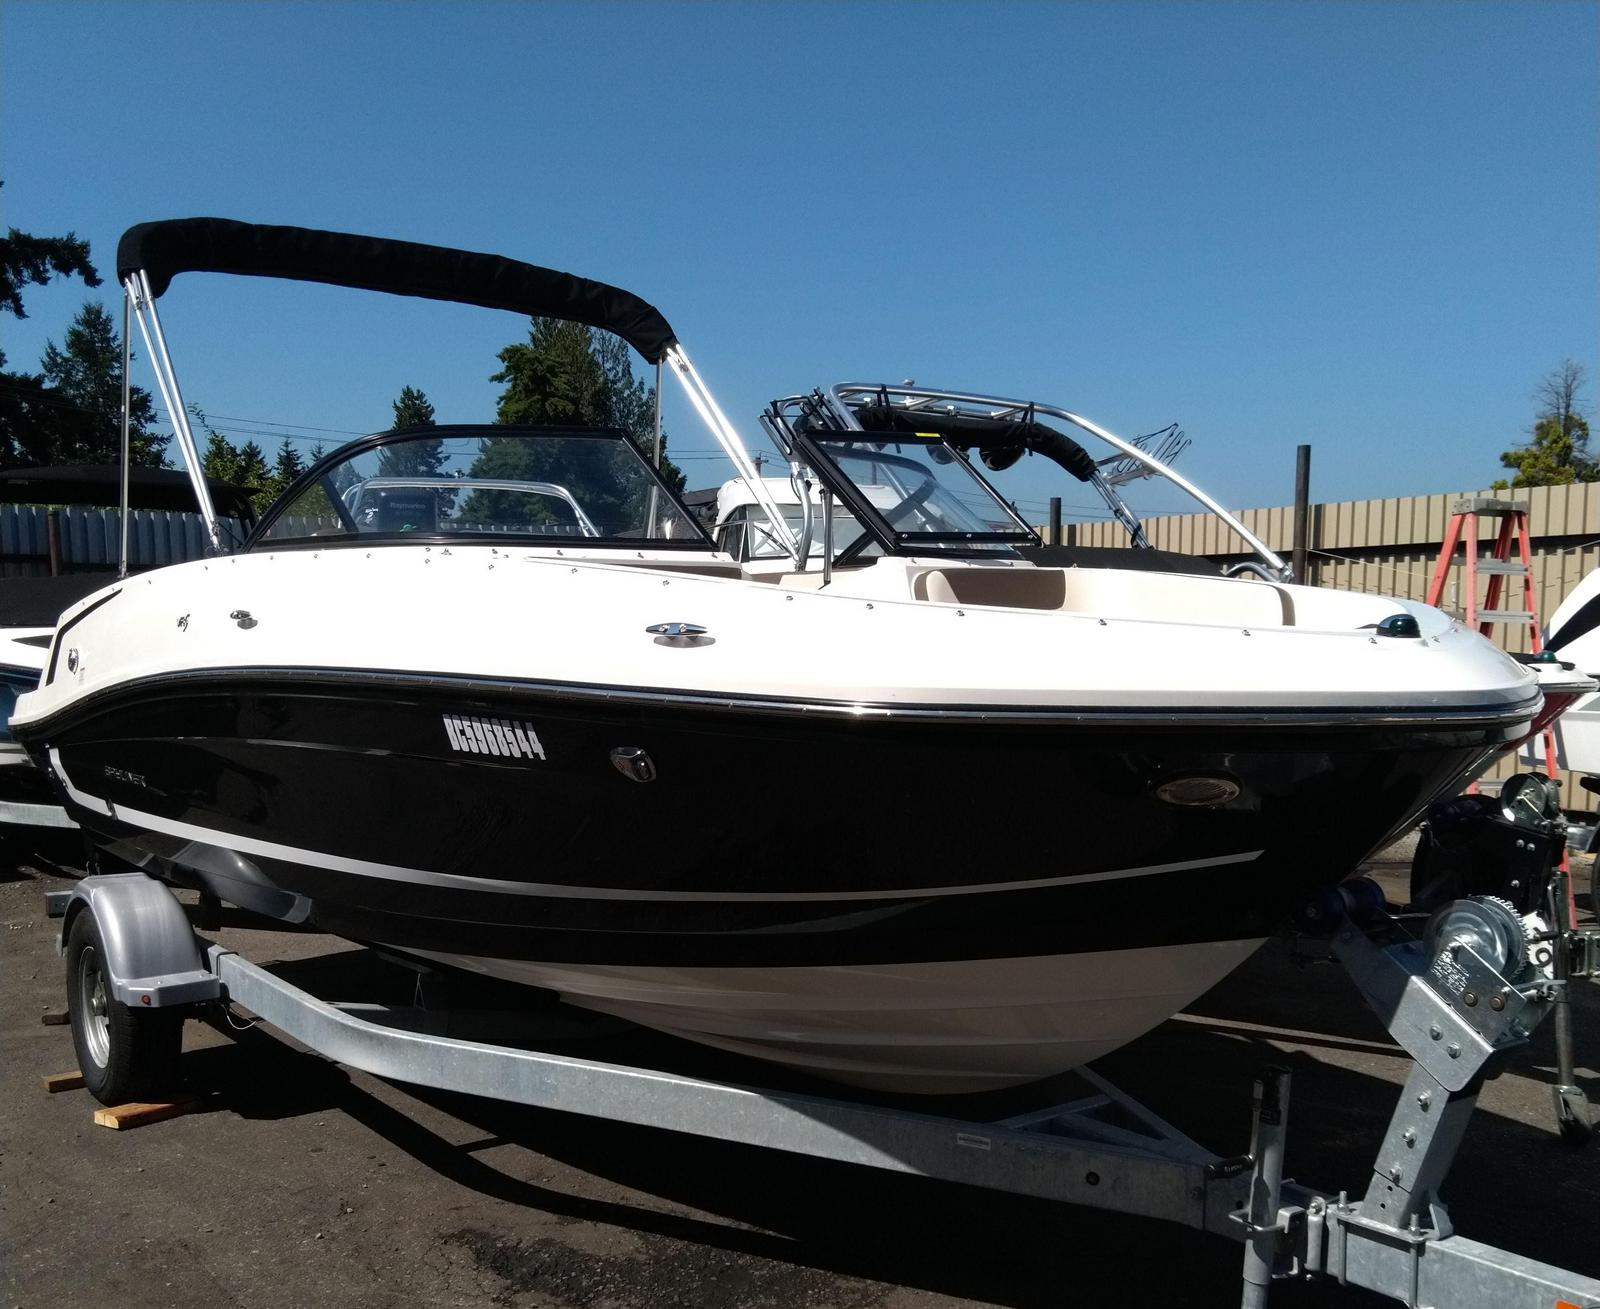 2018 Bayliner boat for sale, model of the boat is VR5 Bowrider & Image # 1 of 2